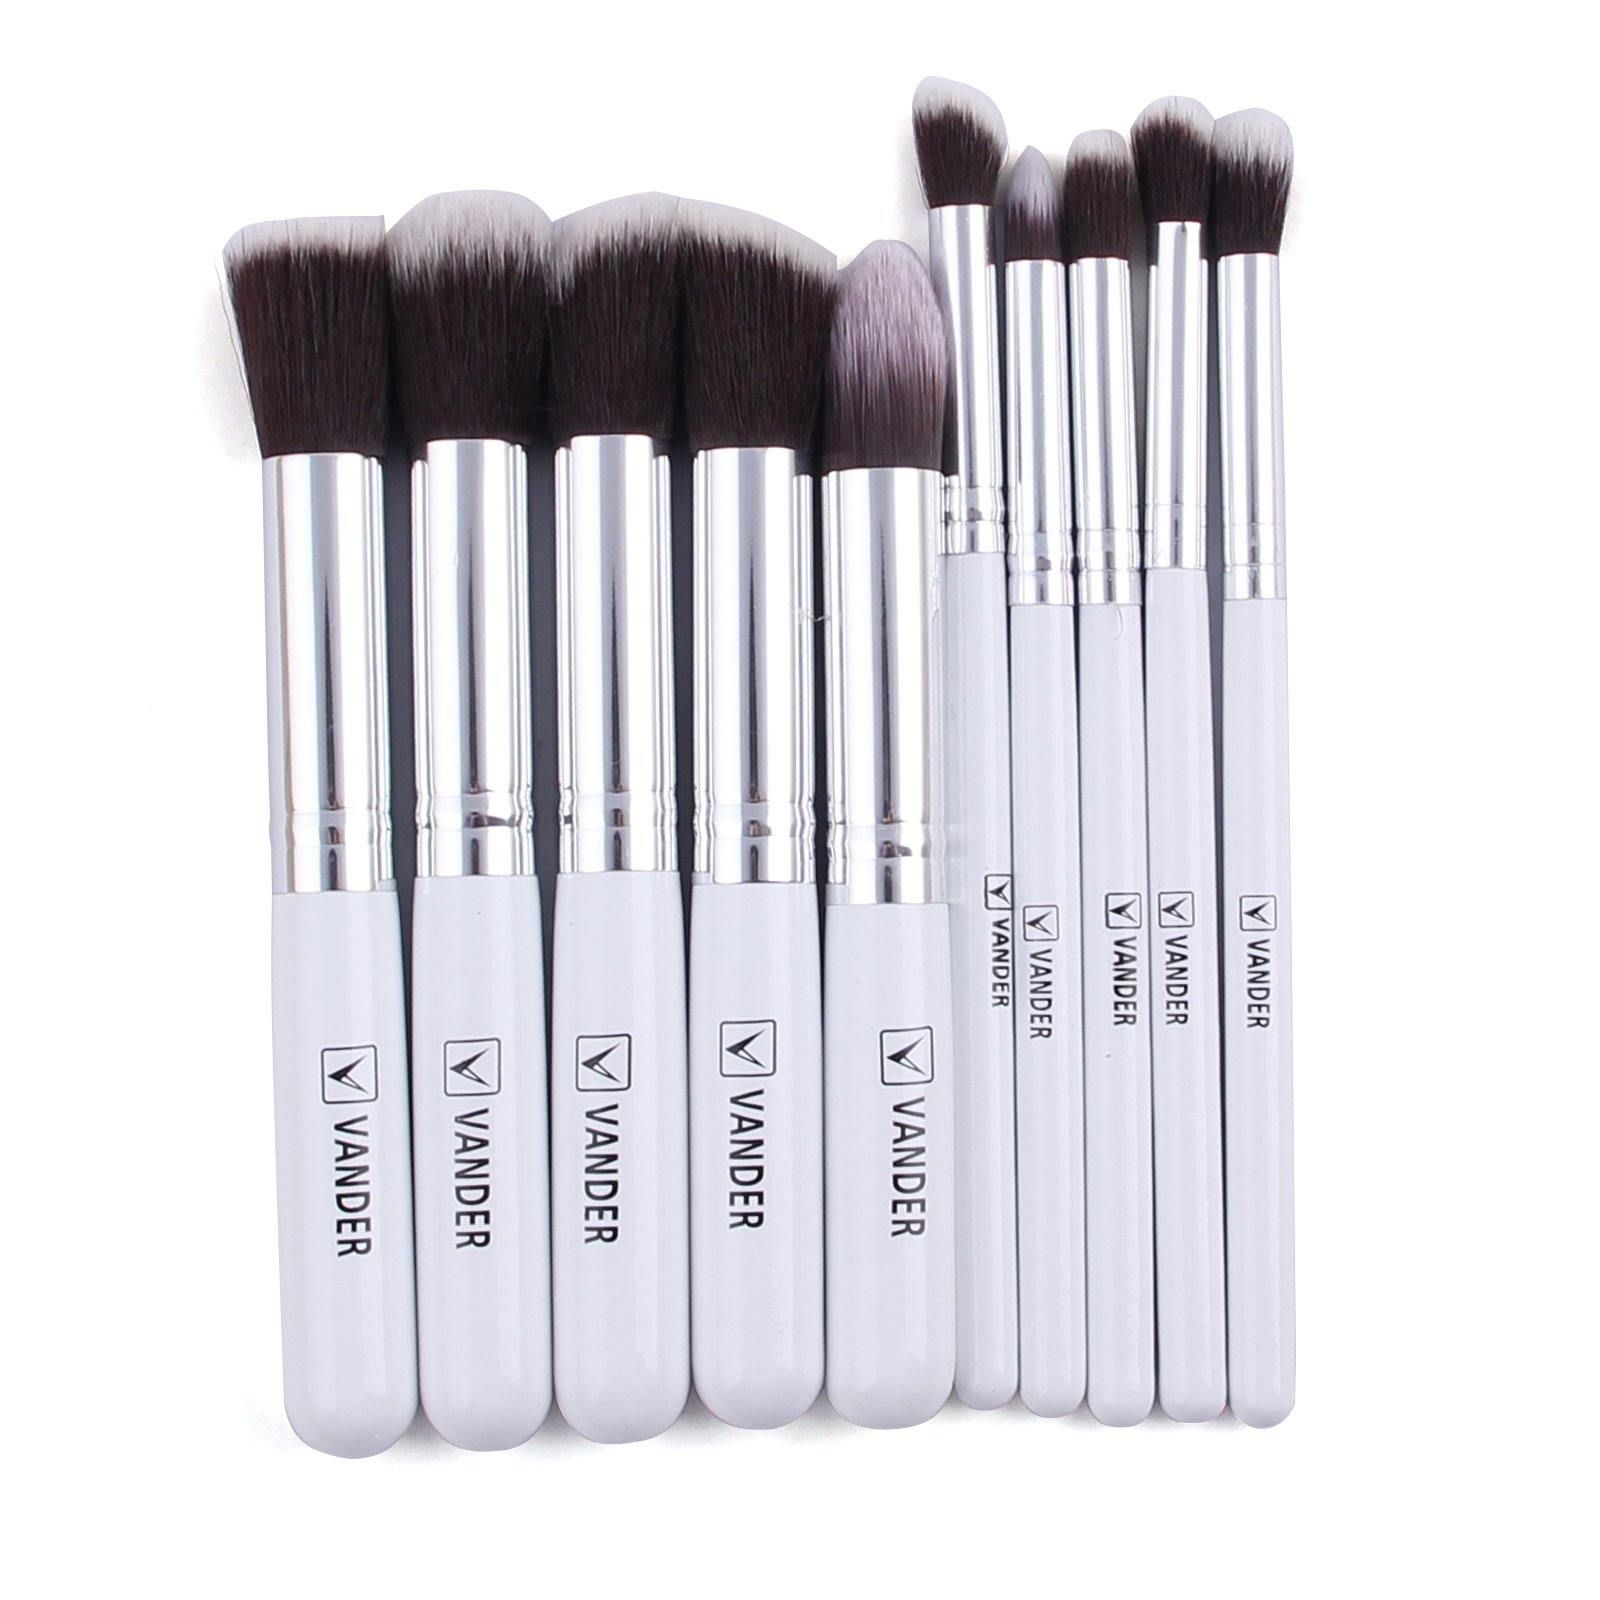 Vander 10 Sätze Make-up Pinsel Set Gold Tube weiß – Silber